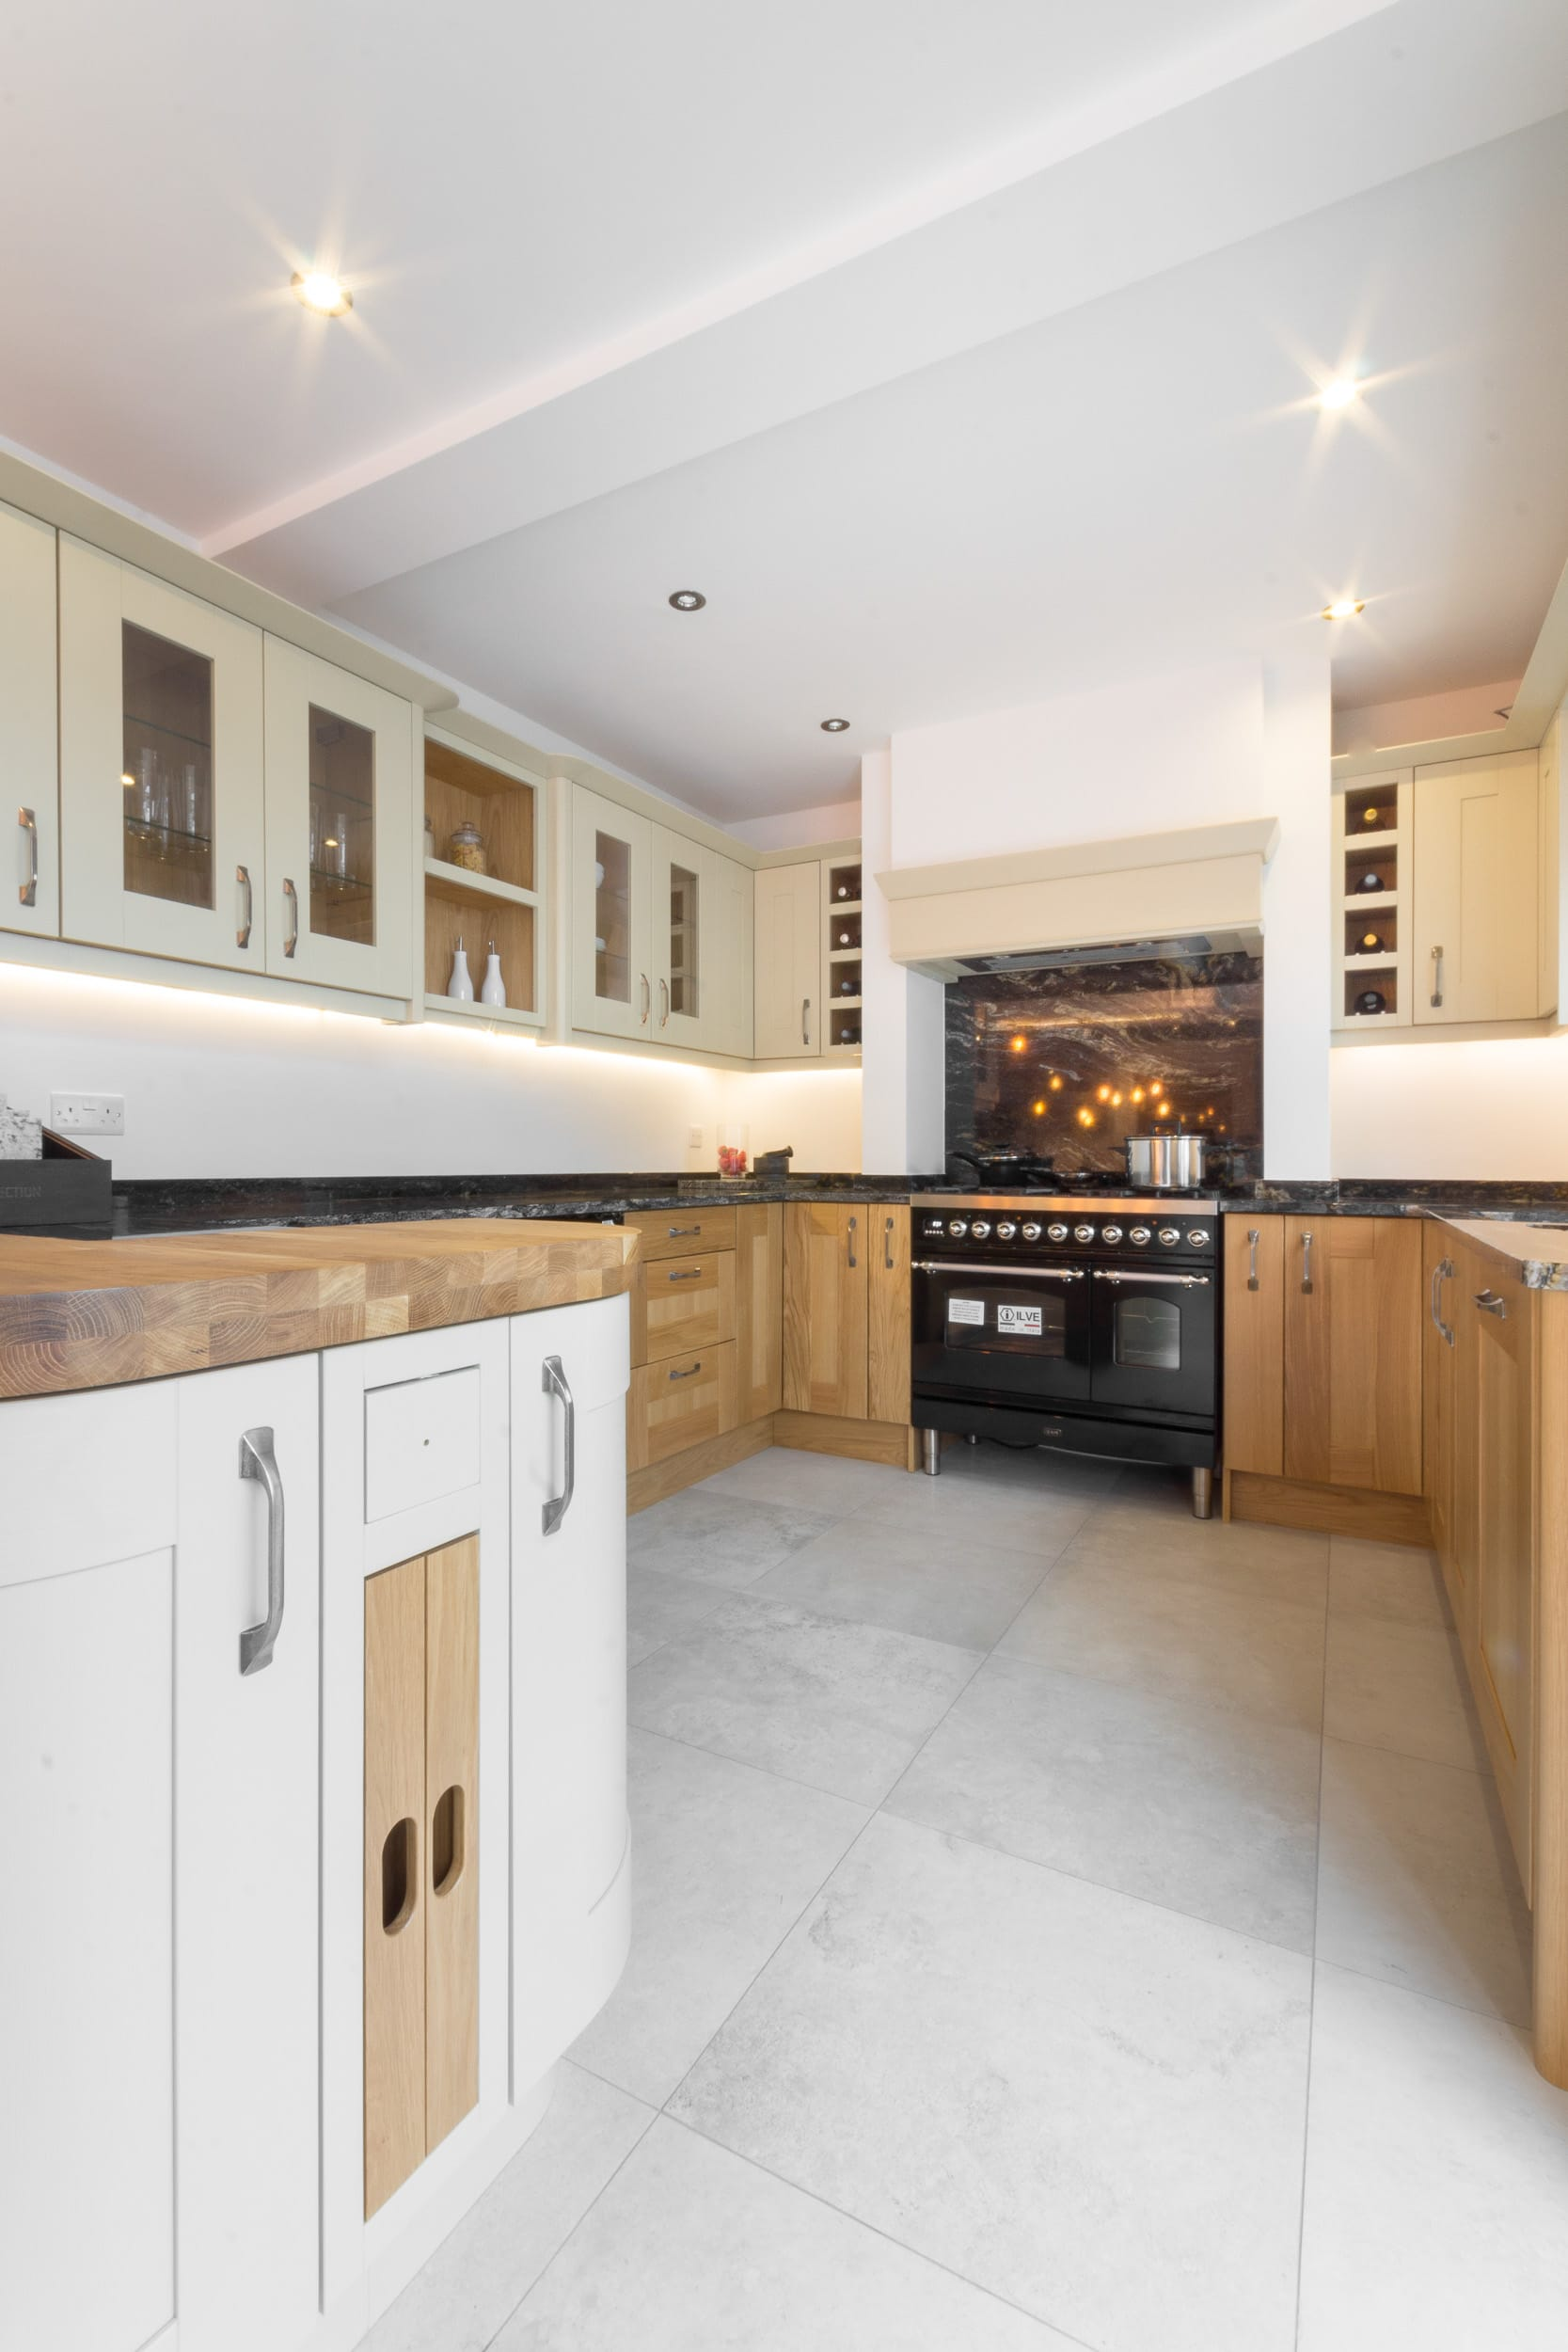 Kitchen-Showroom-Webbs-Kendal-32.jpg